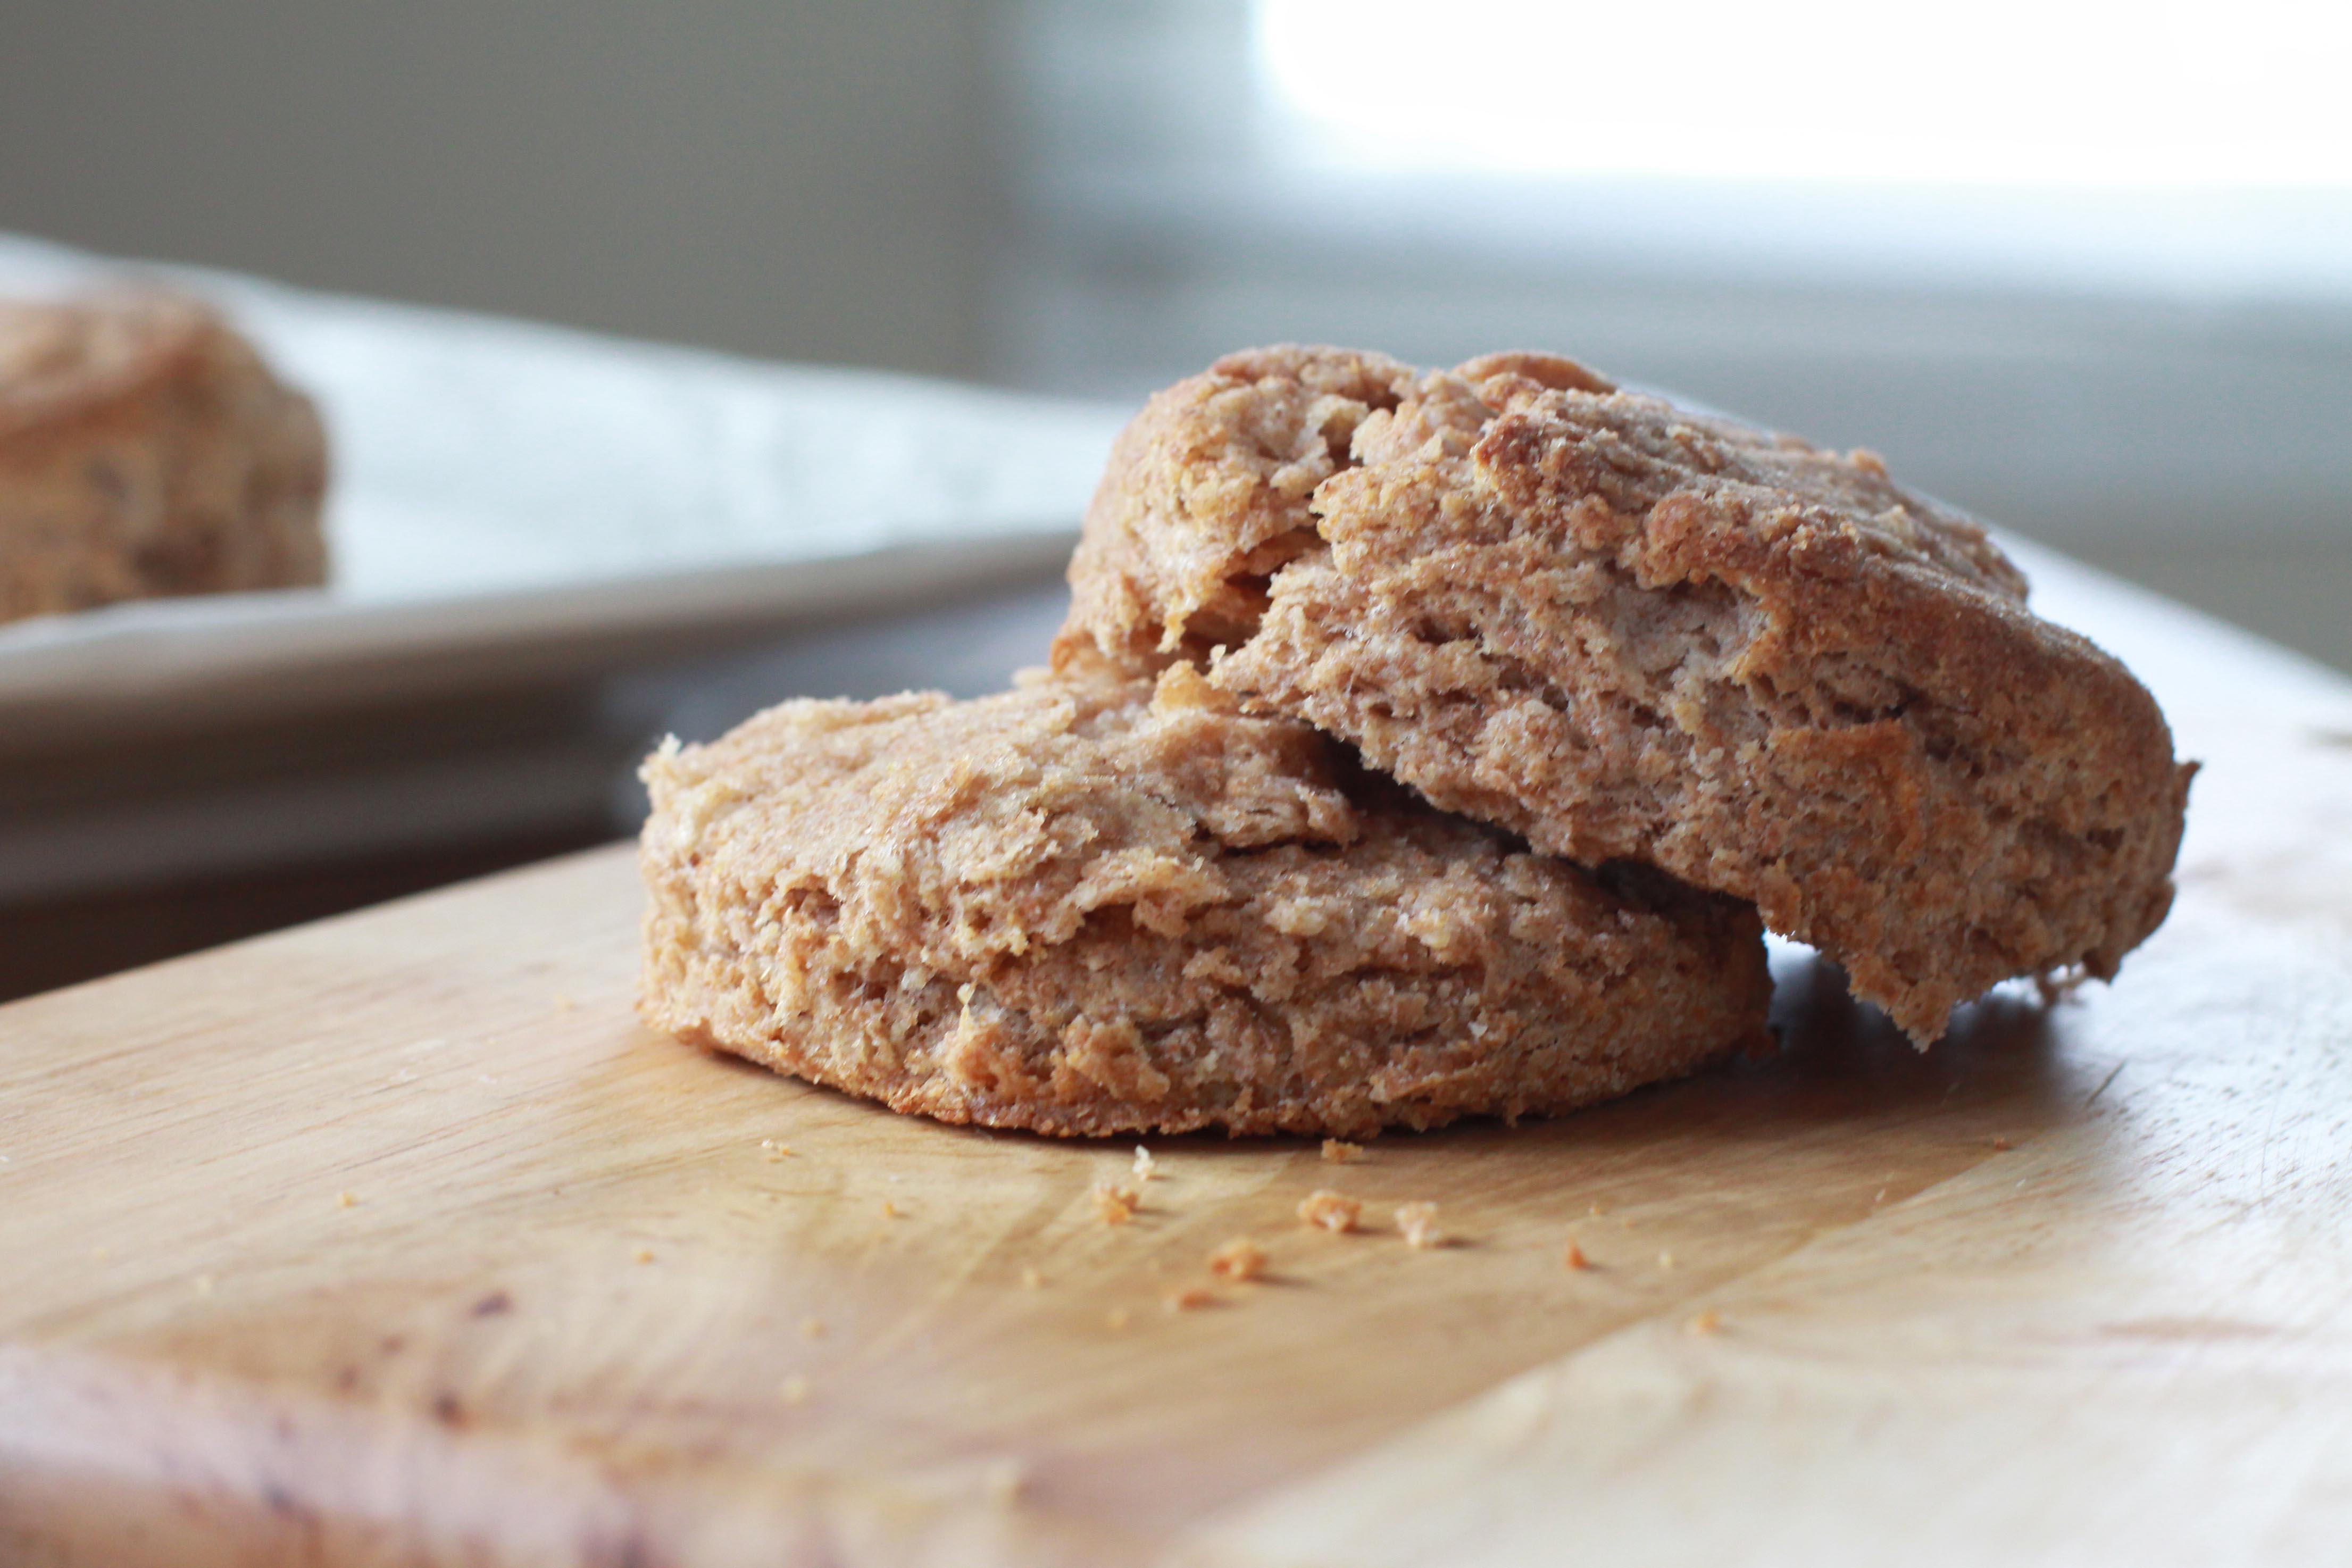 Whole Wheat Biscuits with Jam - Espresso and CreamEspresso and Cream